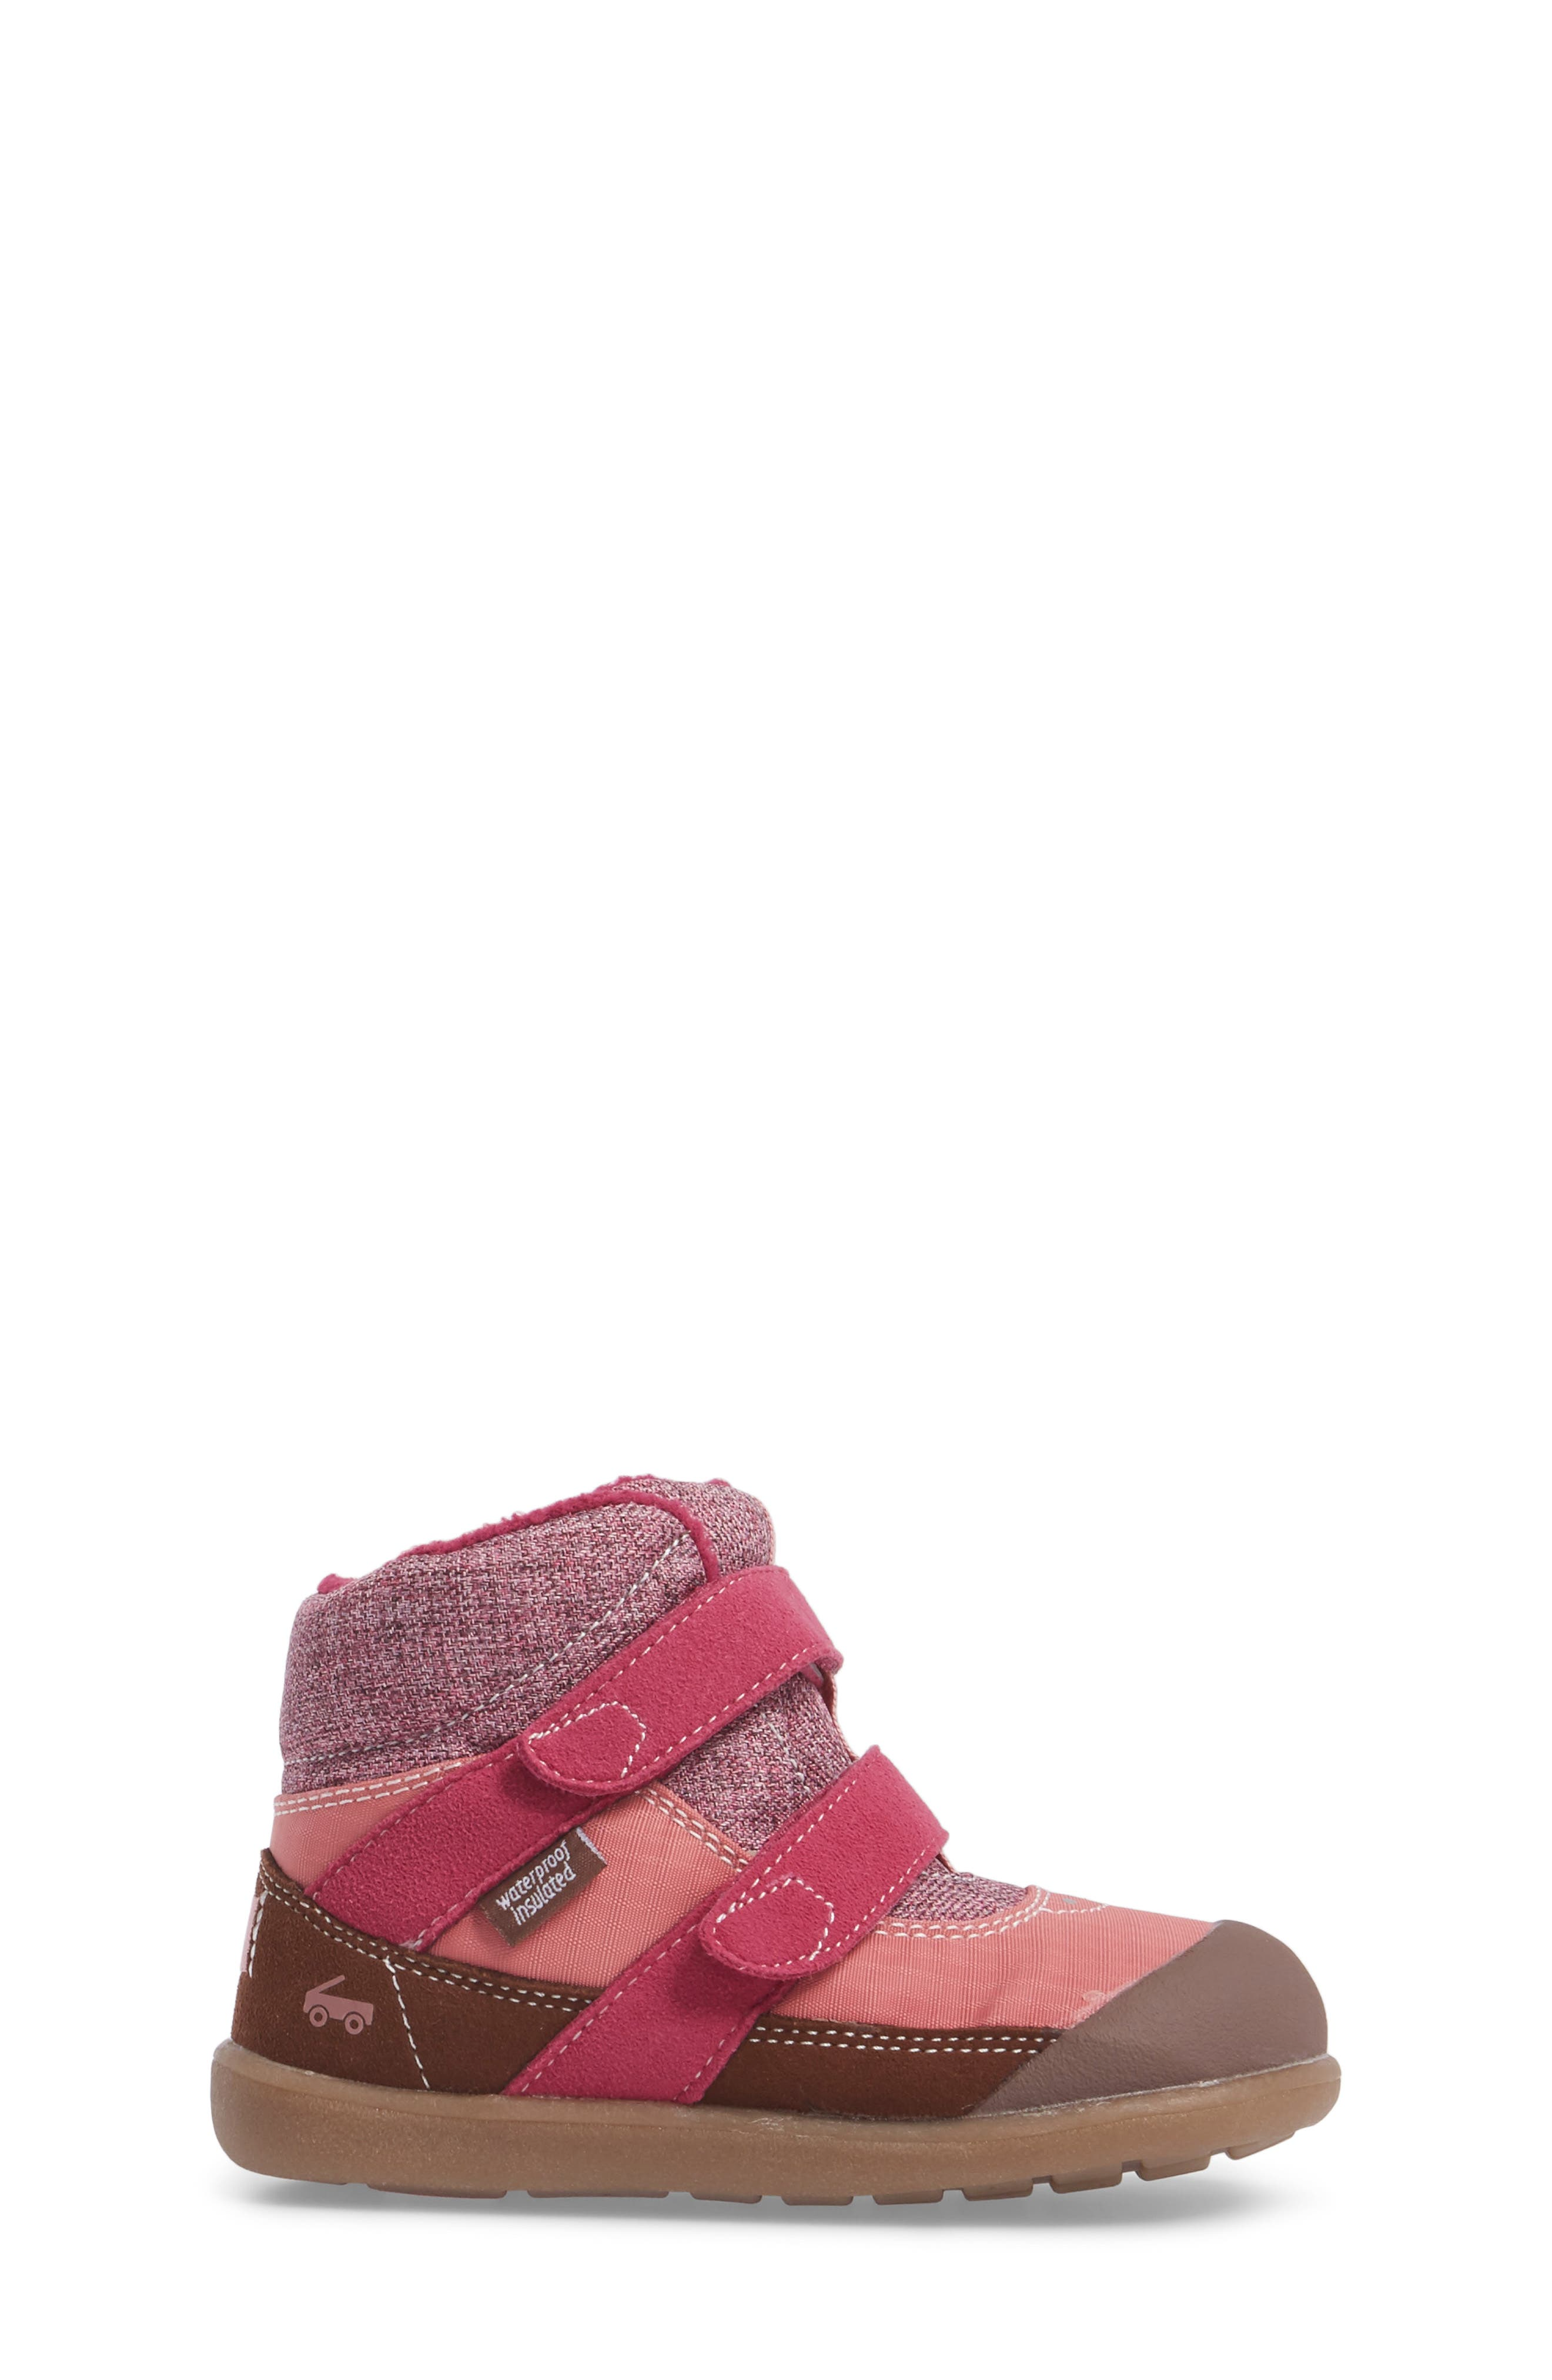 Alternate Image 3  - See Kai Run Atlas Waterproof Boot (Baby, Walker & Toddler)